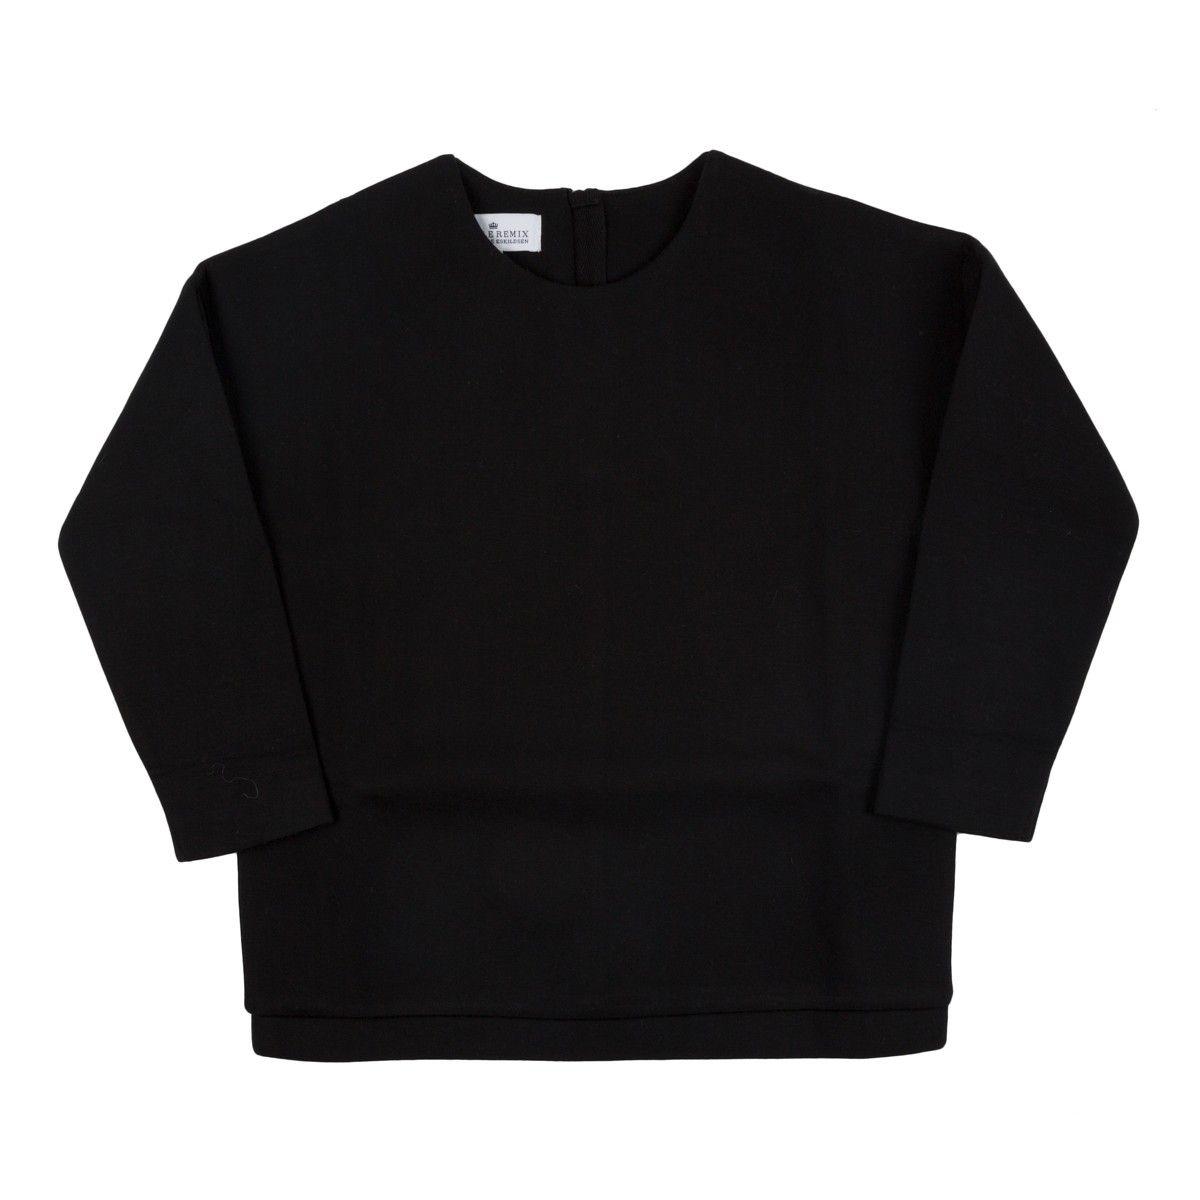 Grace Sleeve - Little Remix - Kids and Teen fashion Online - Webshop Goldfish.be Kids Web Store Mechelen